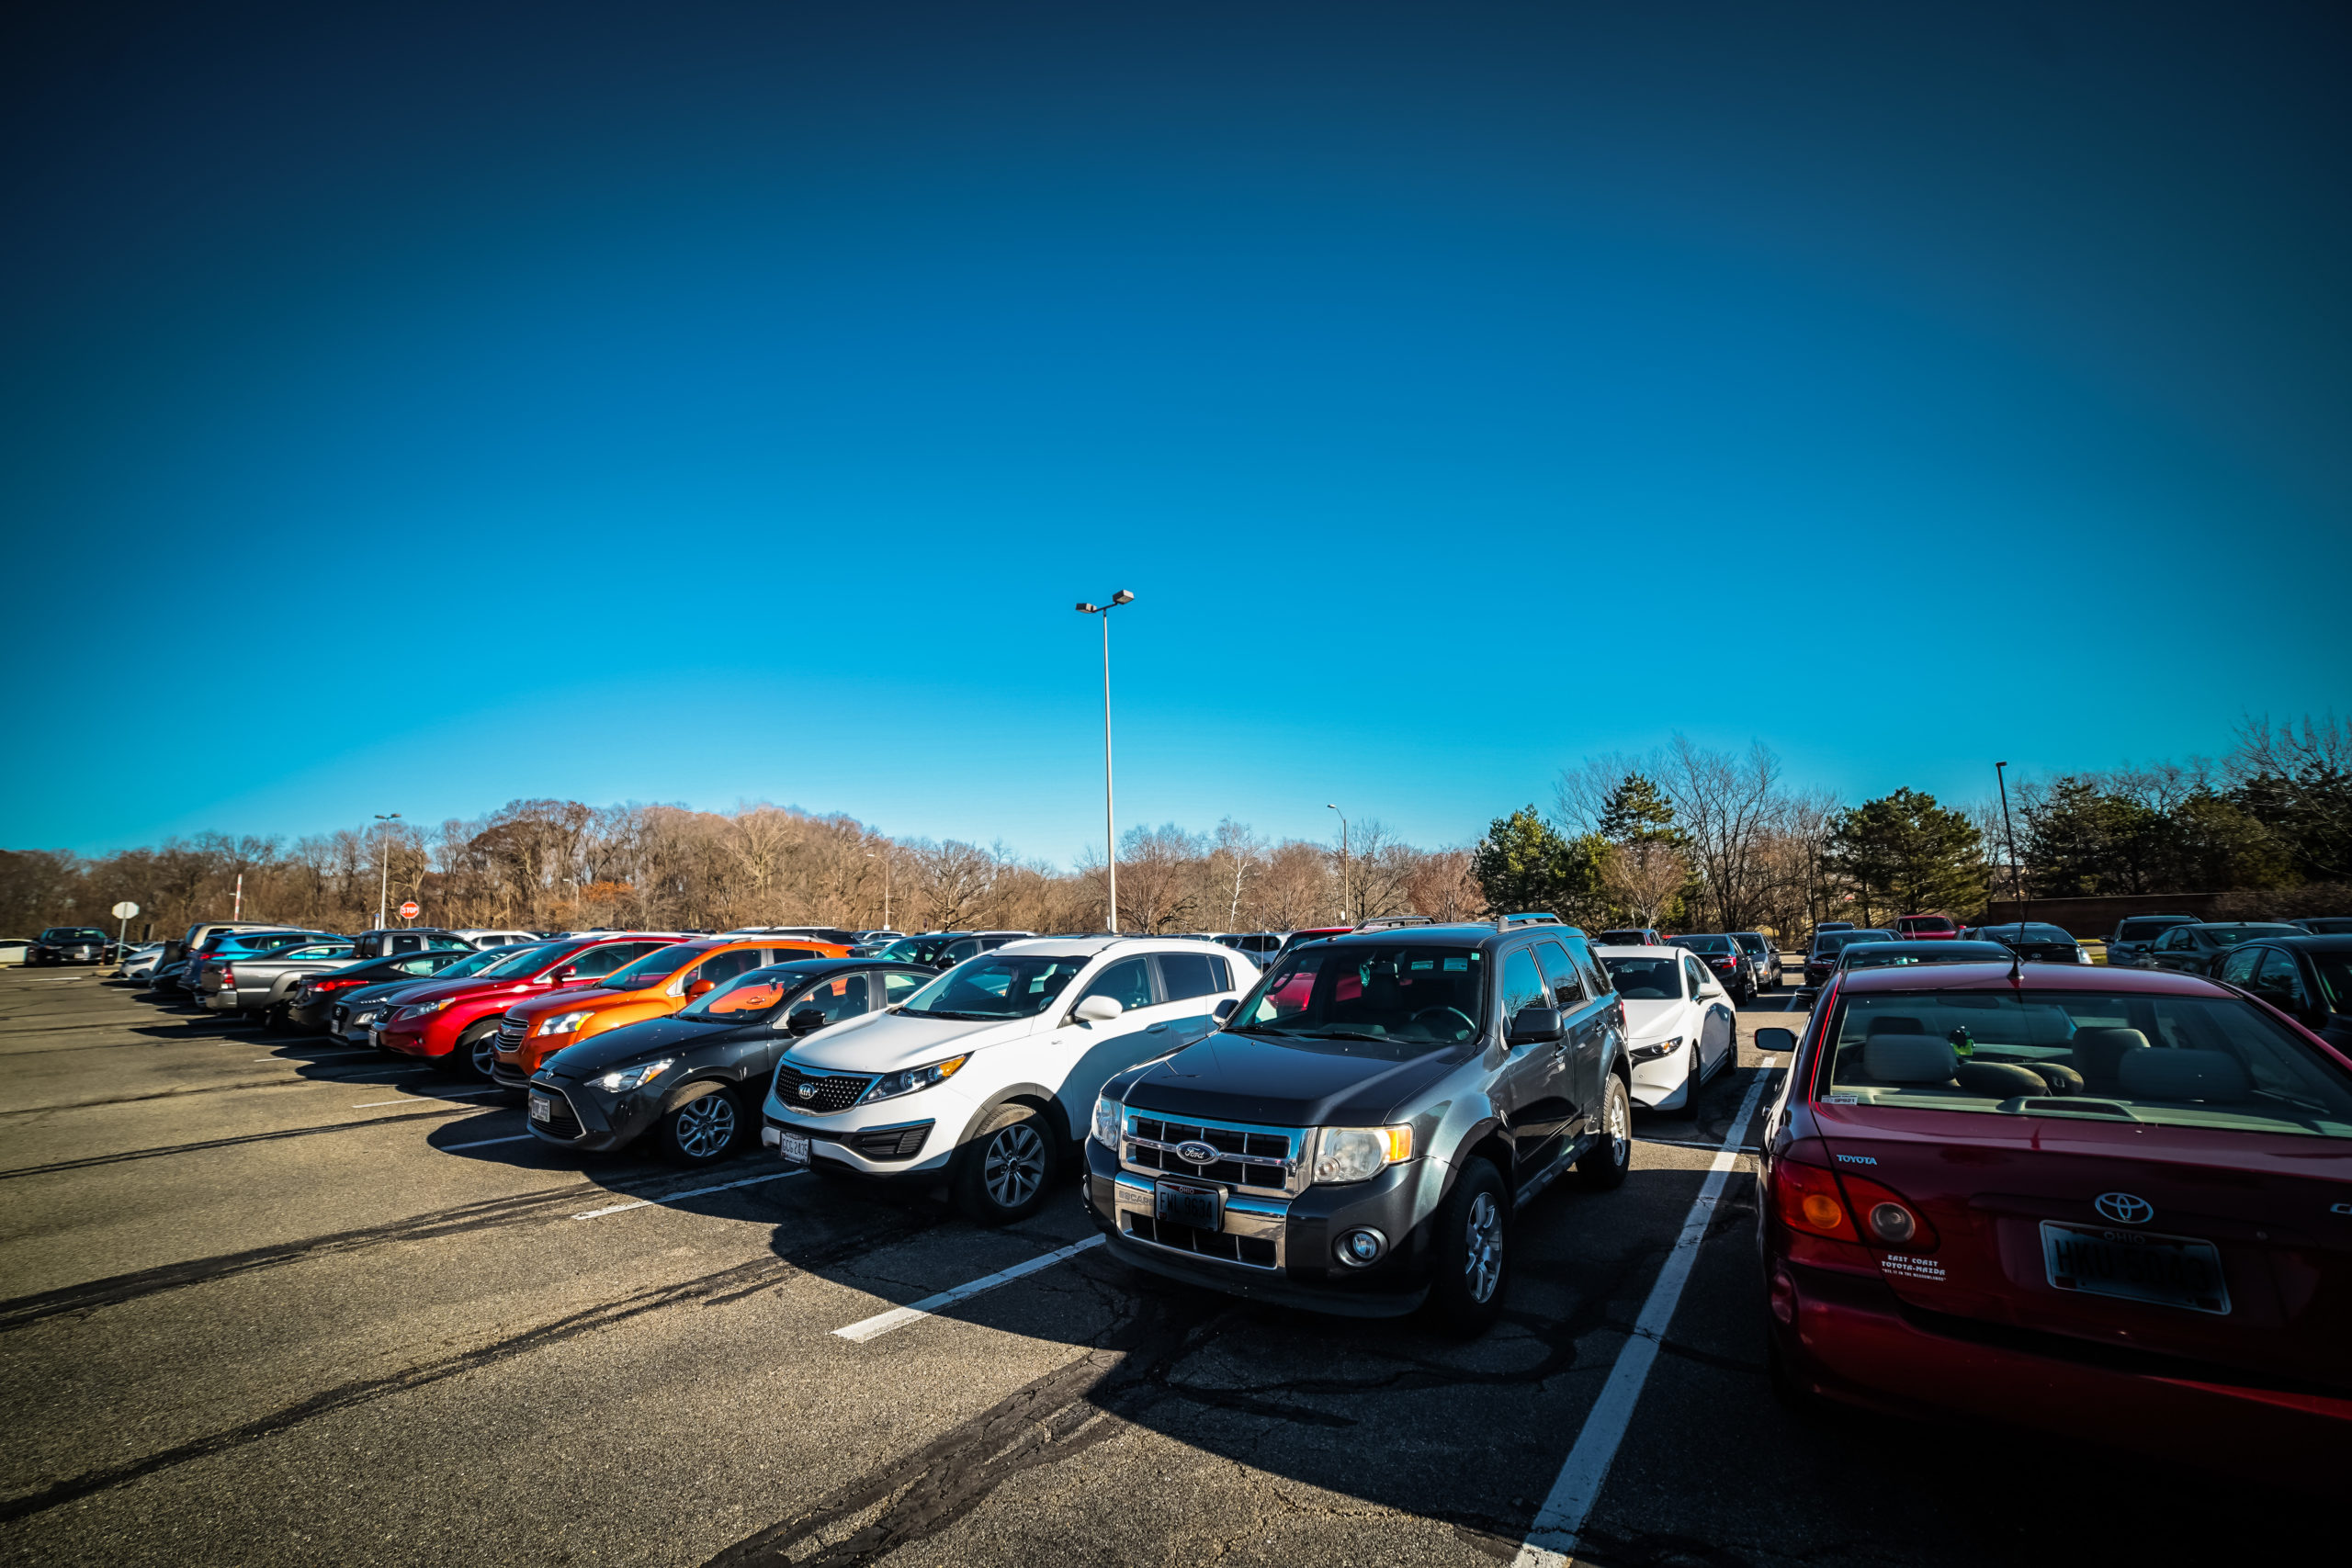 WSU Parking | Photo by Soham Parikh | The Wright State Guardian